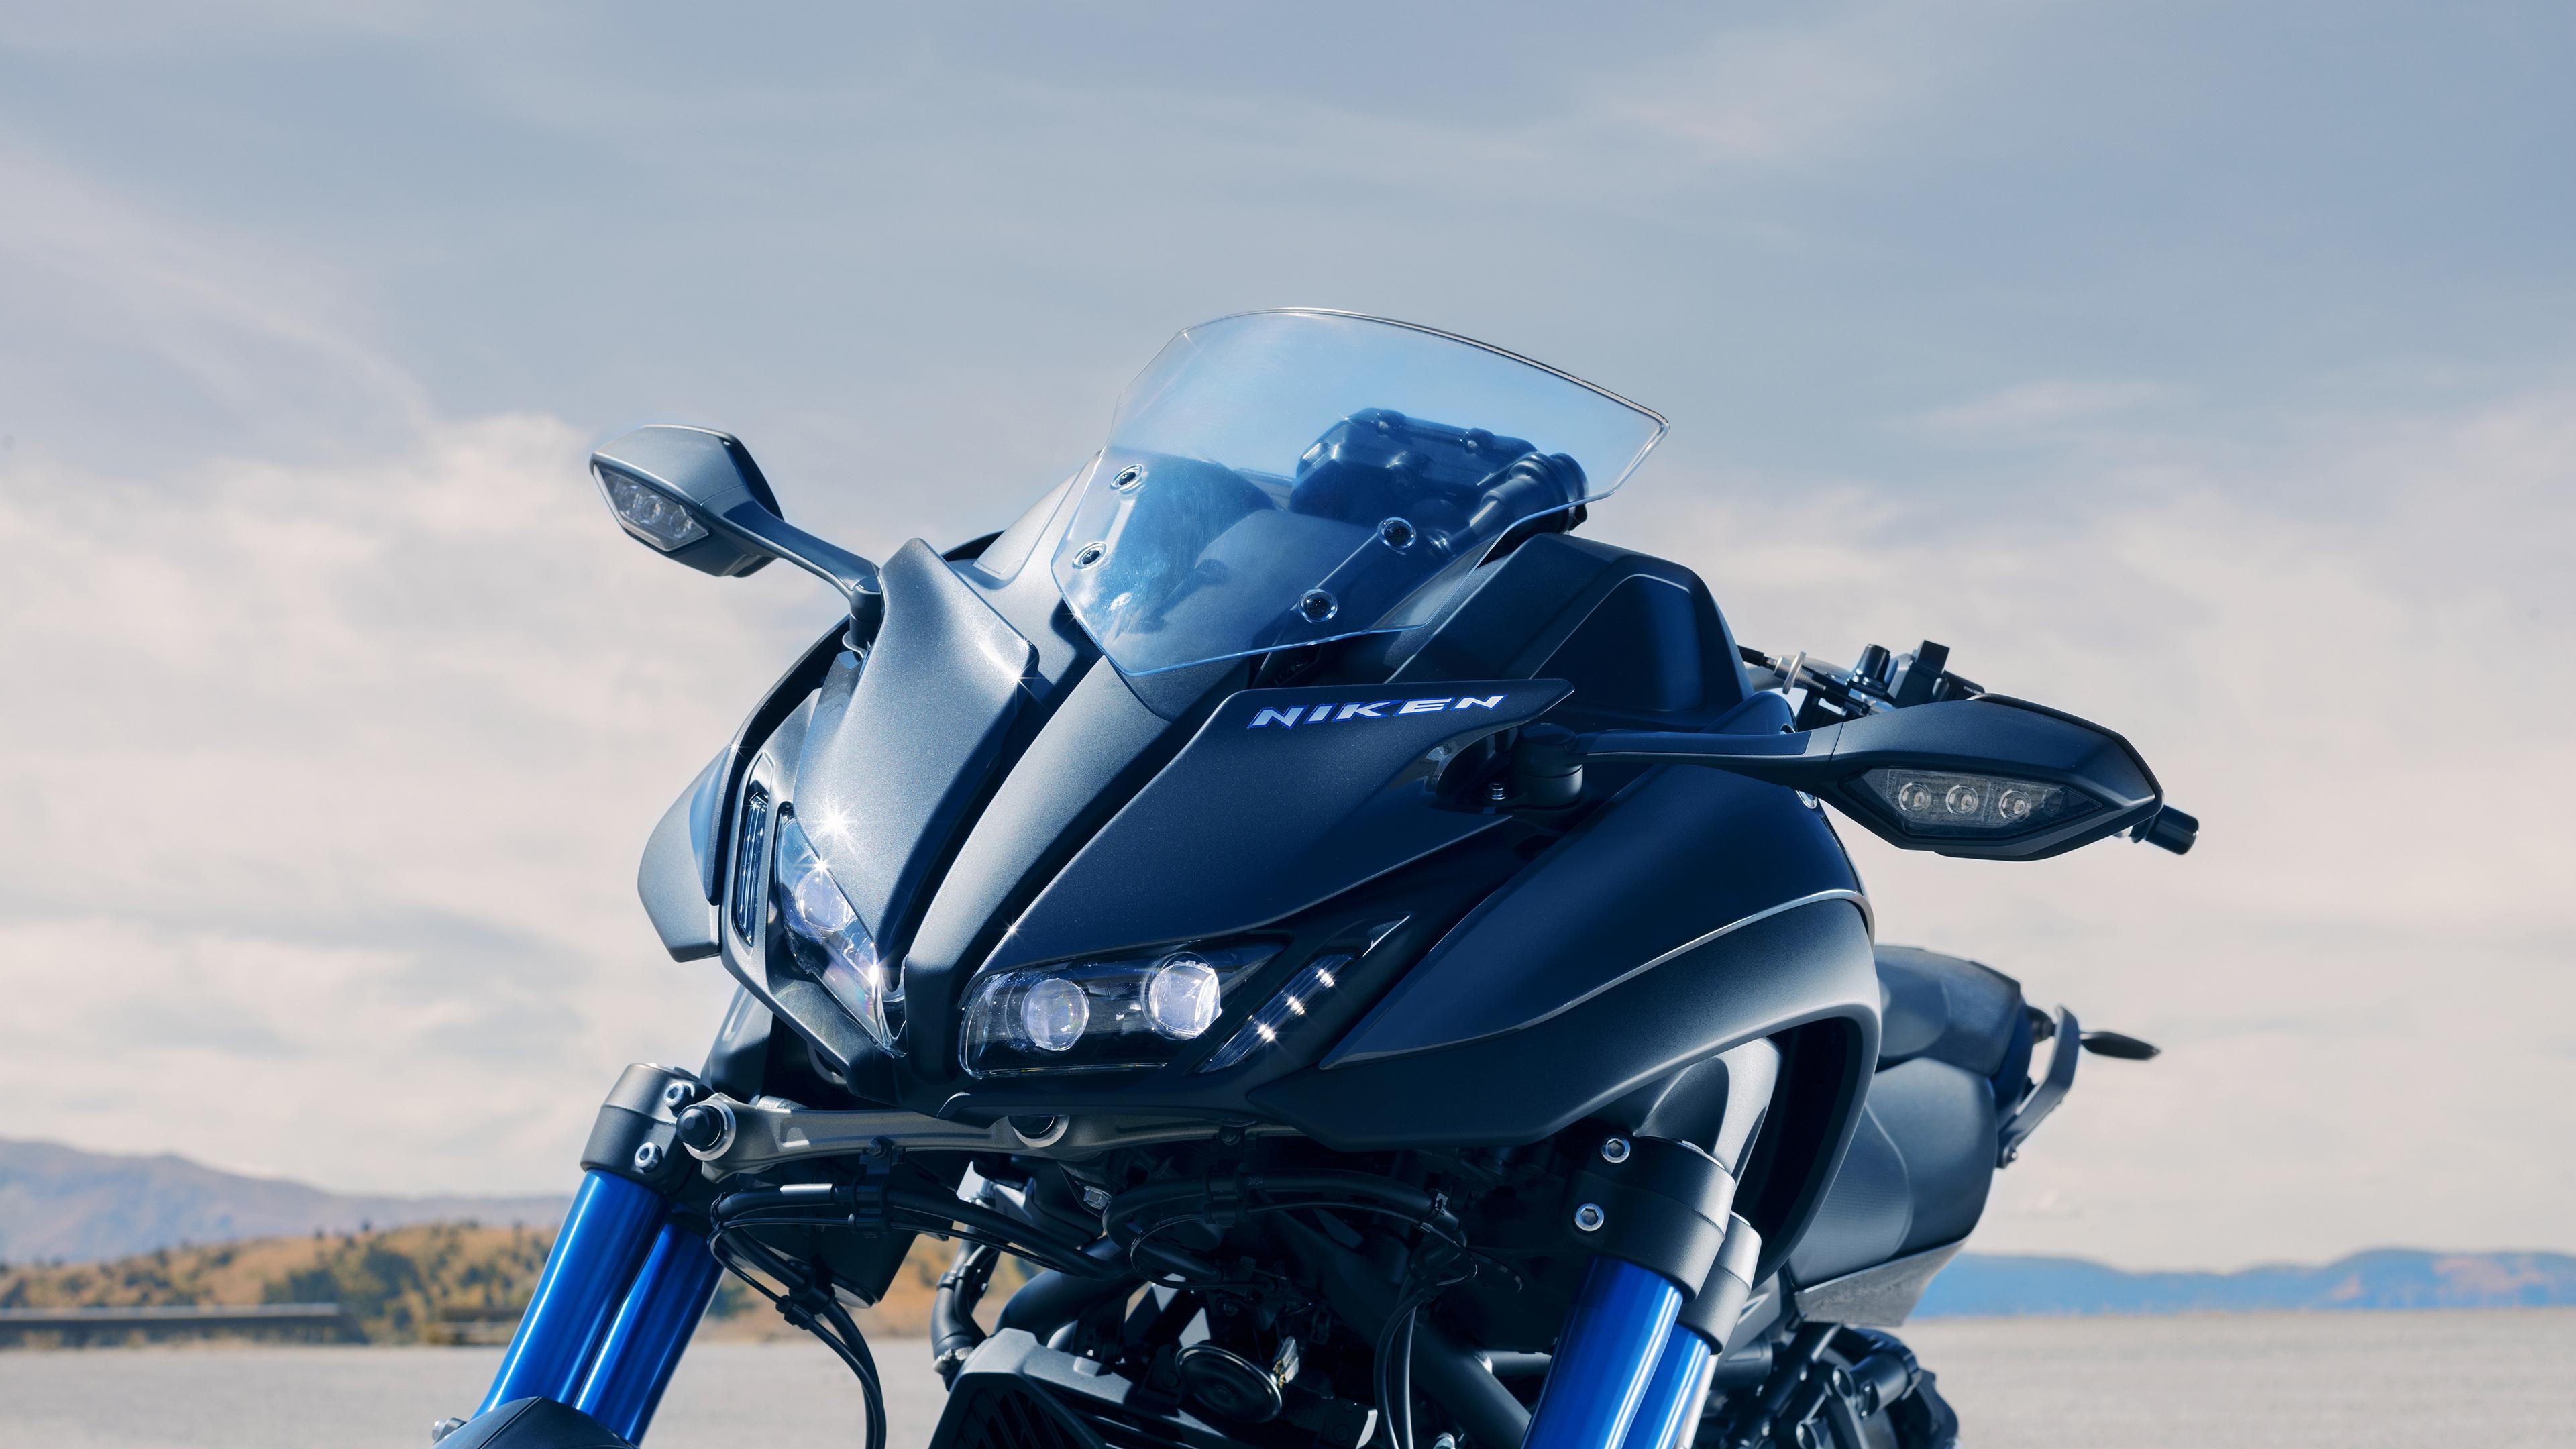 yamaha niken sport touring motorcycle 1536316516 - Yamaha Niken Sport Touring Motorcycle - yamaha wallpapers, yamaha niken wallpapers, hd-wallpapers, 4k-wallpapers, 2018 bikes wallpapers